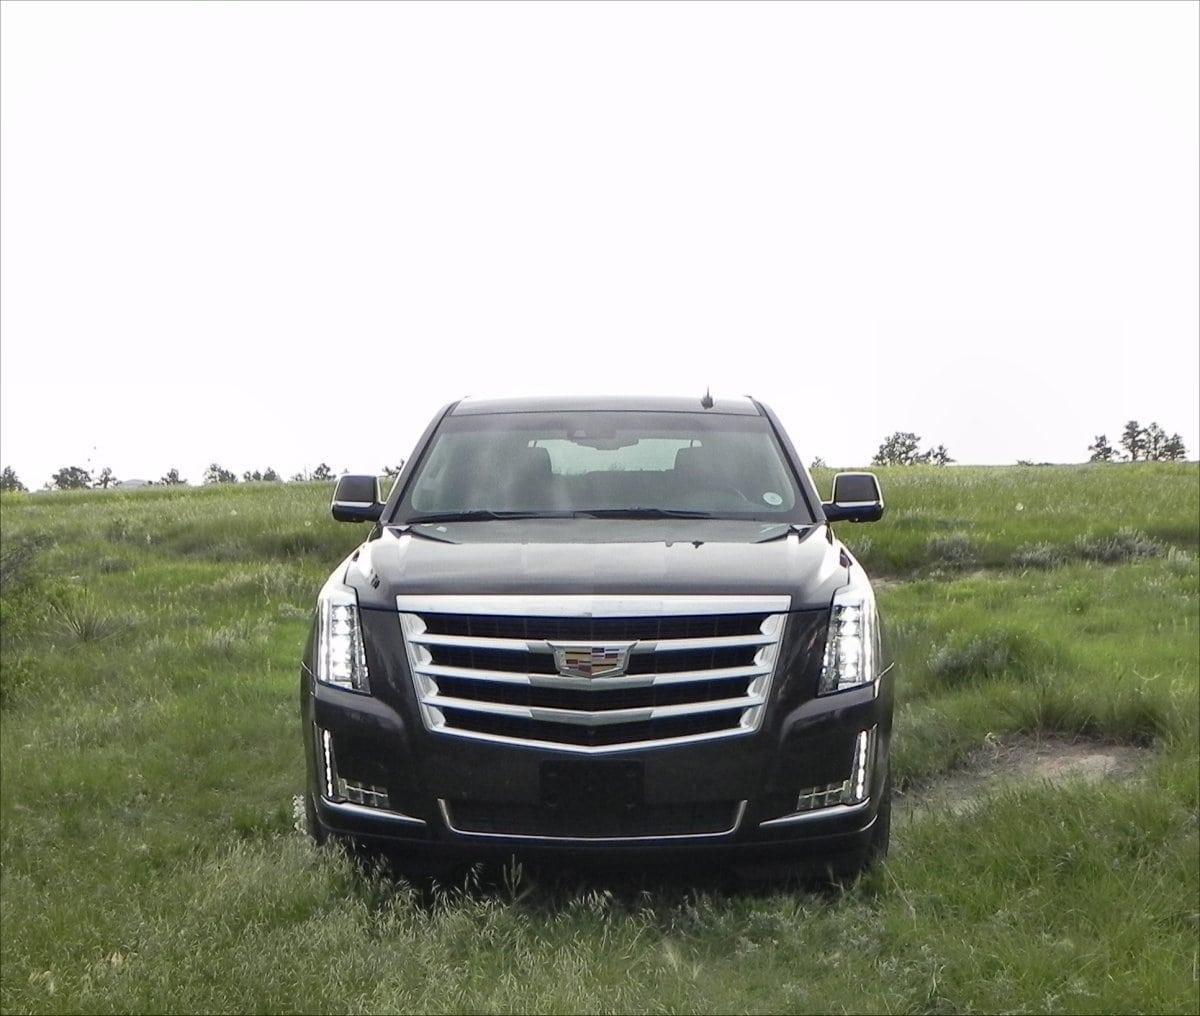 Cadillac Escalade 2015 Used: 2015 Cadillac Escalade Is Big, Posh Goodness